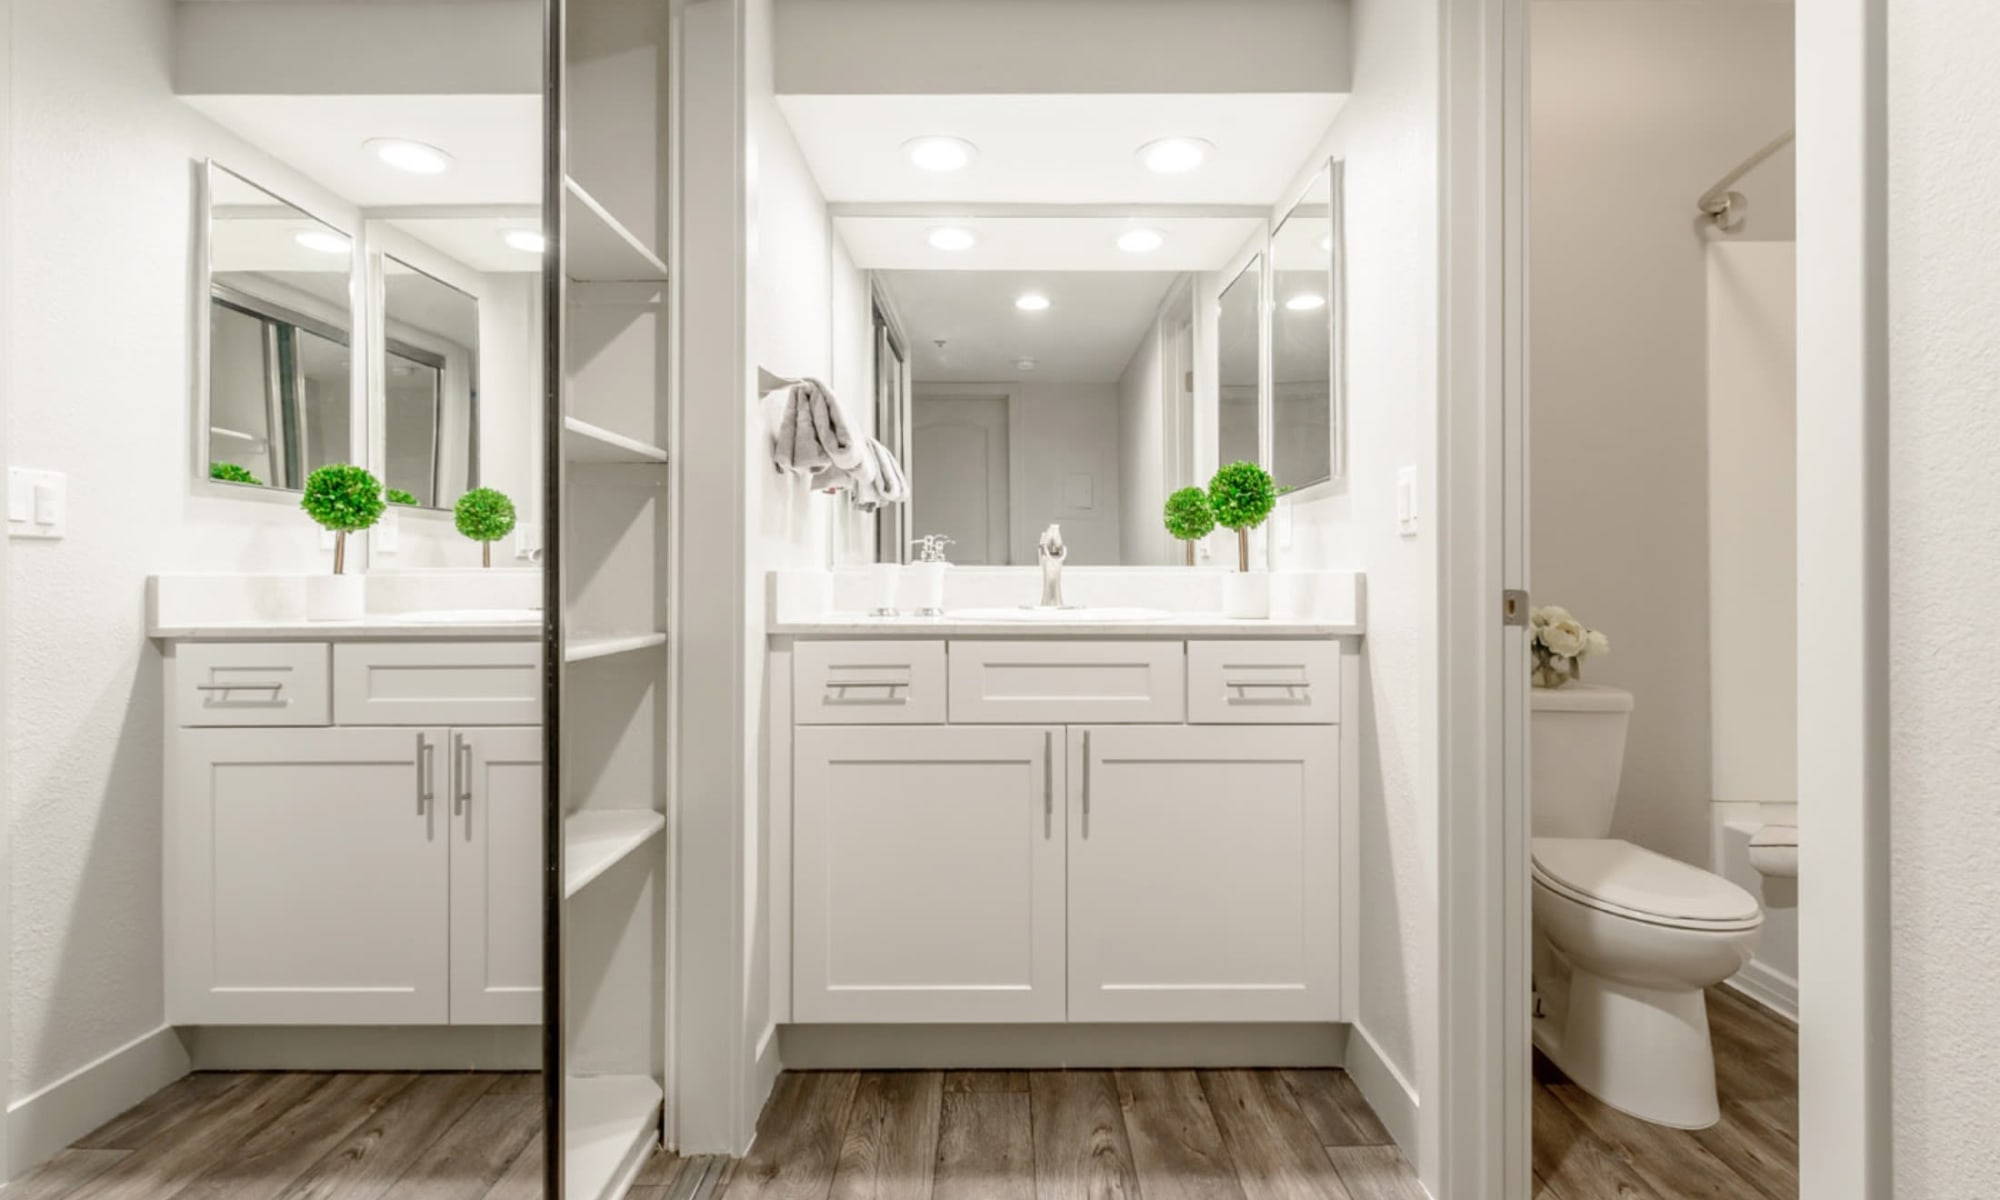 Bathroom with a large vanity mirror and sleek quartz countertop in a remodeled apartment at Sendero Huntington Beach in Huntington Beach, California